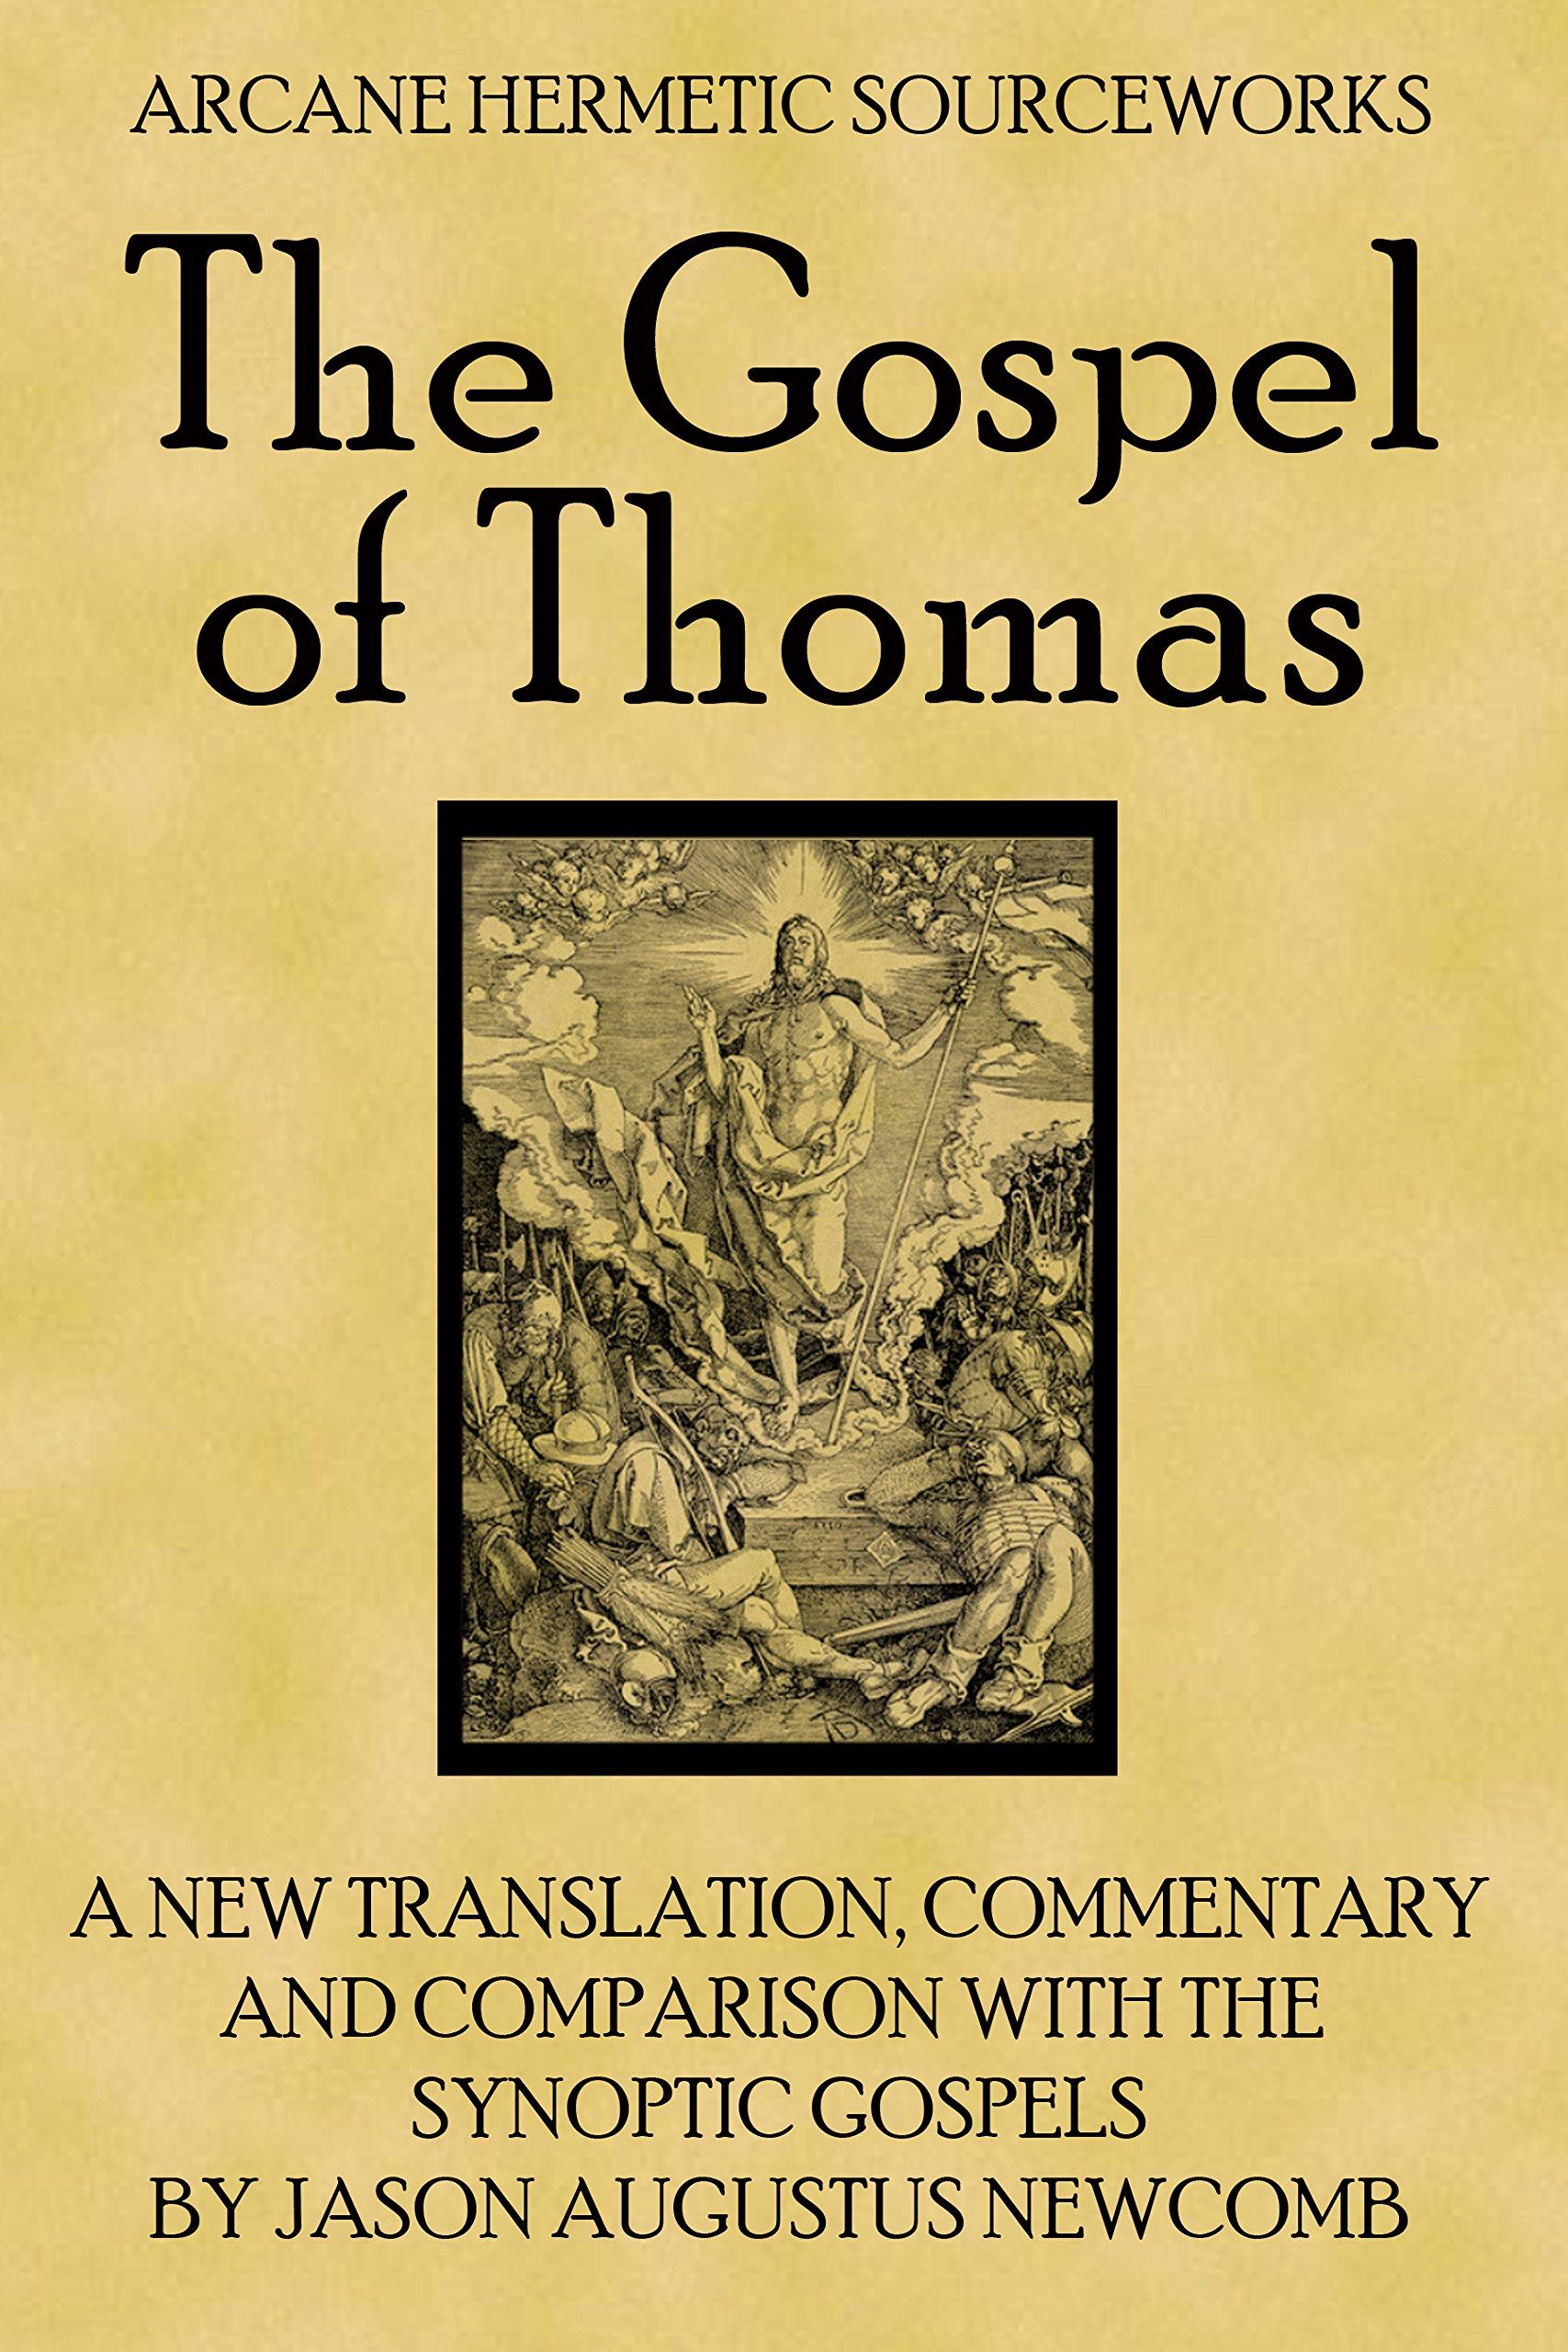 dating Gospel av Thomas Onkyo TX-nr616 oppkobling